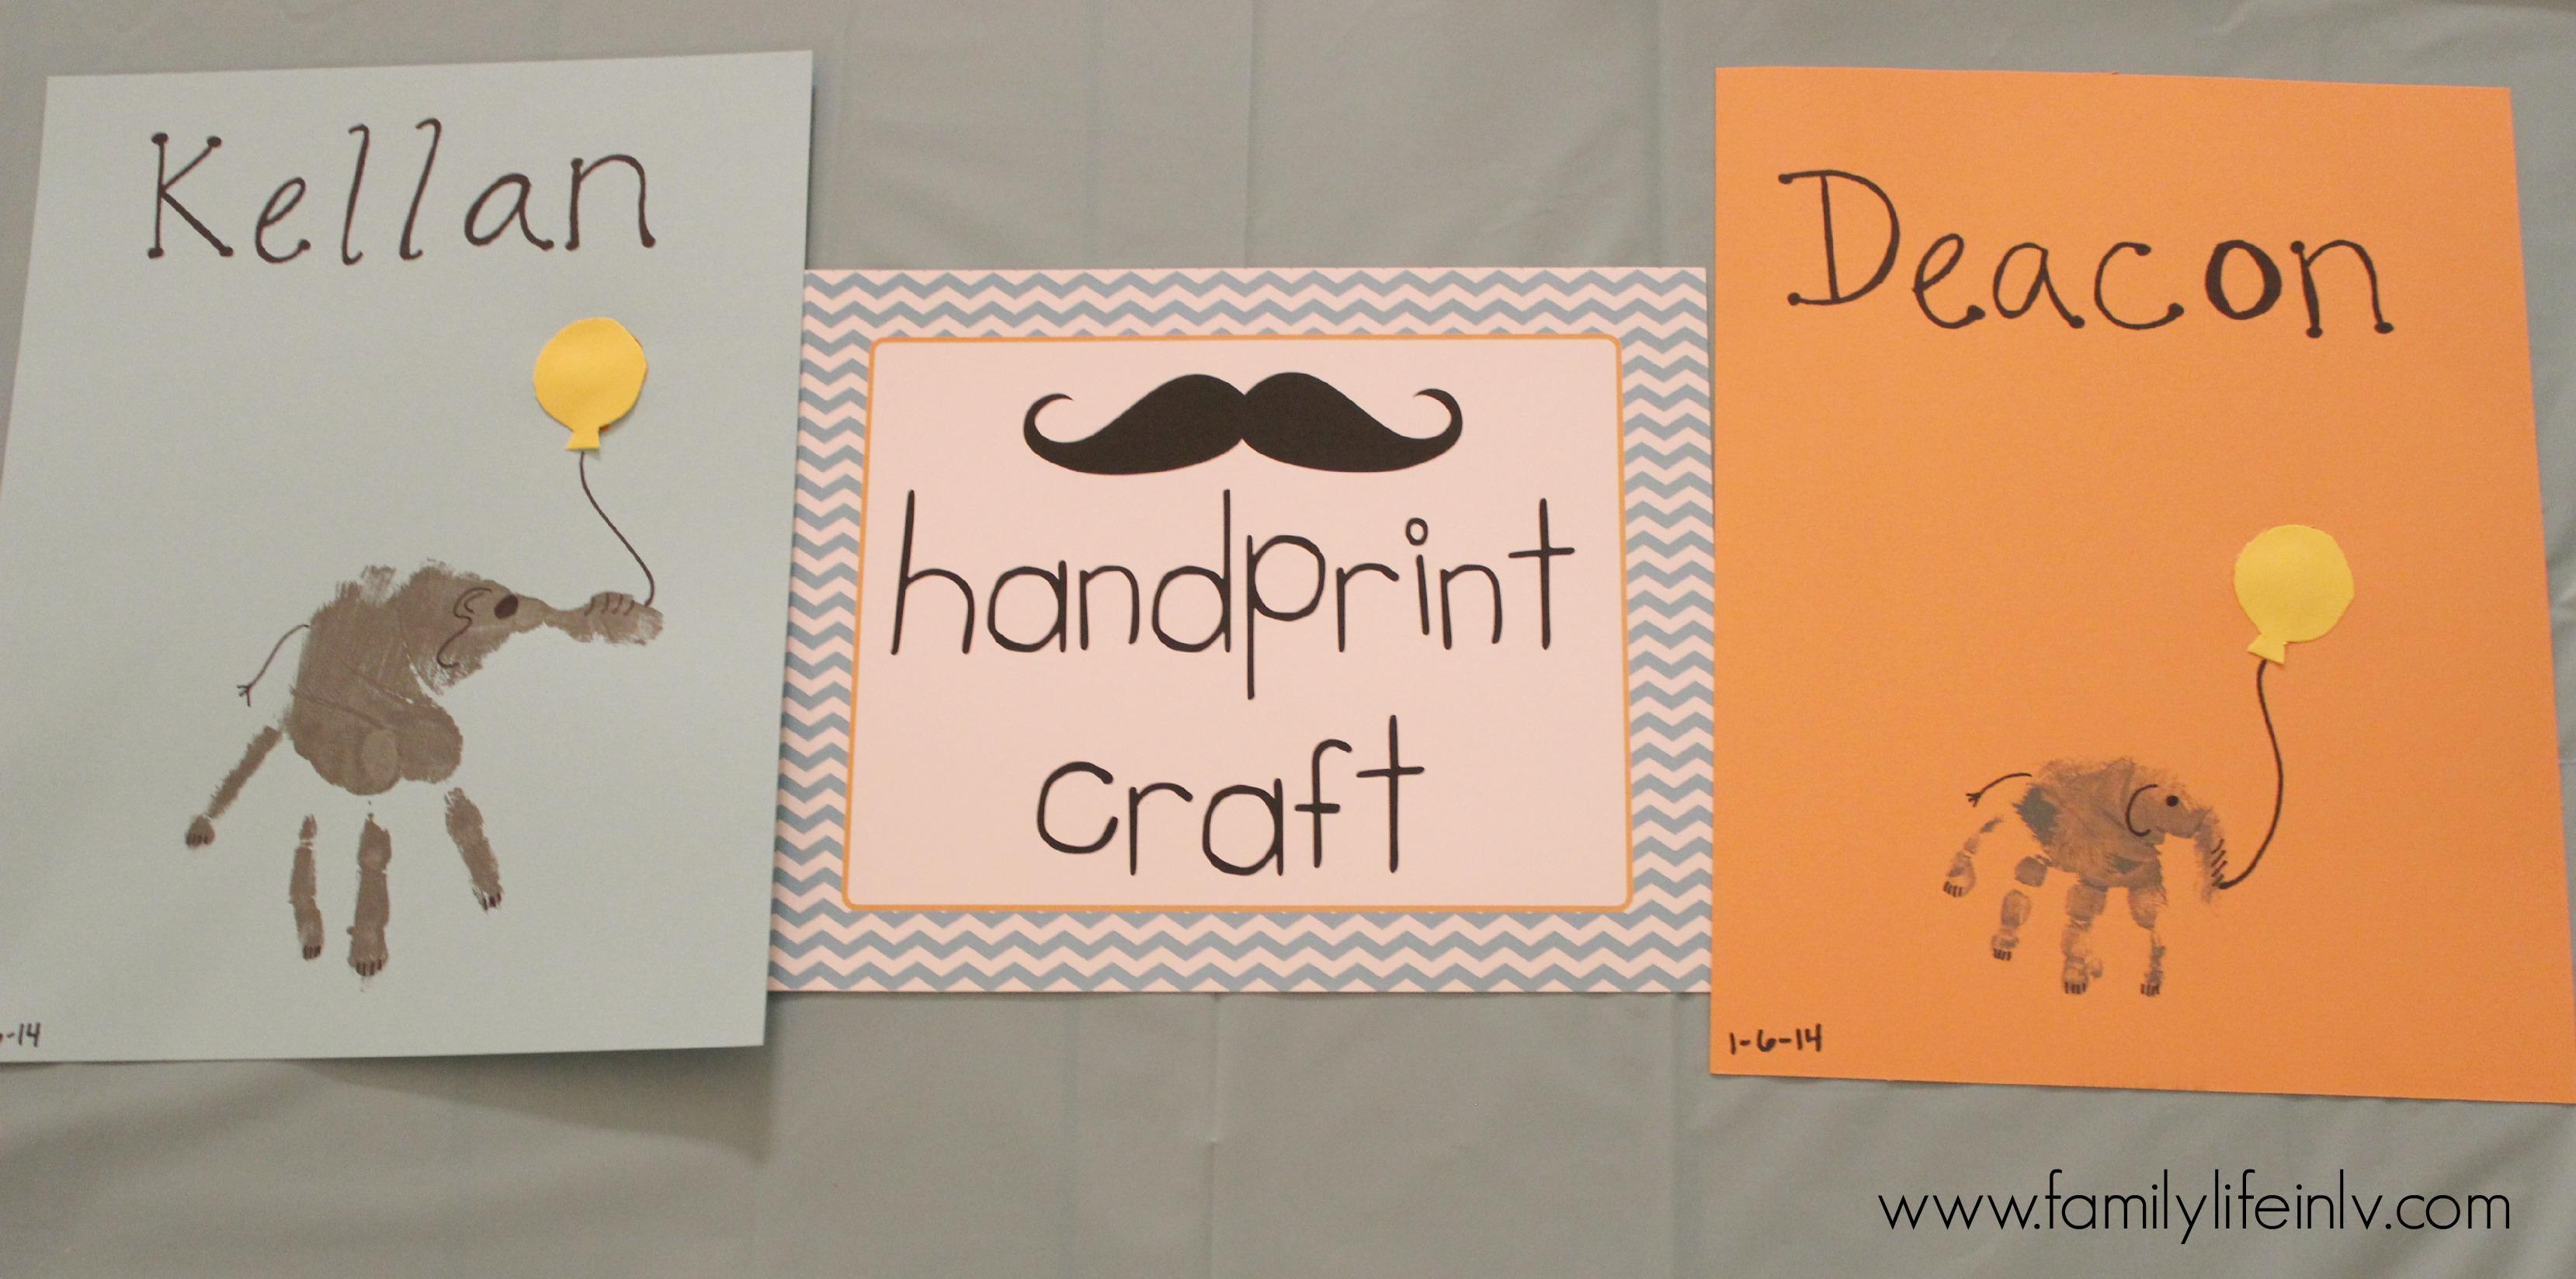 """handprint craft"" ""elephant handprint"" ""Birthday Party"" 'Elephant Birthday"" ""1st Birthday Party"" 'Elephant theme Birthday"" 'Birthday"" 'Baby Birthday"""